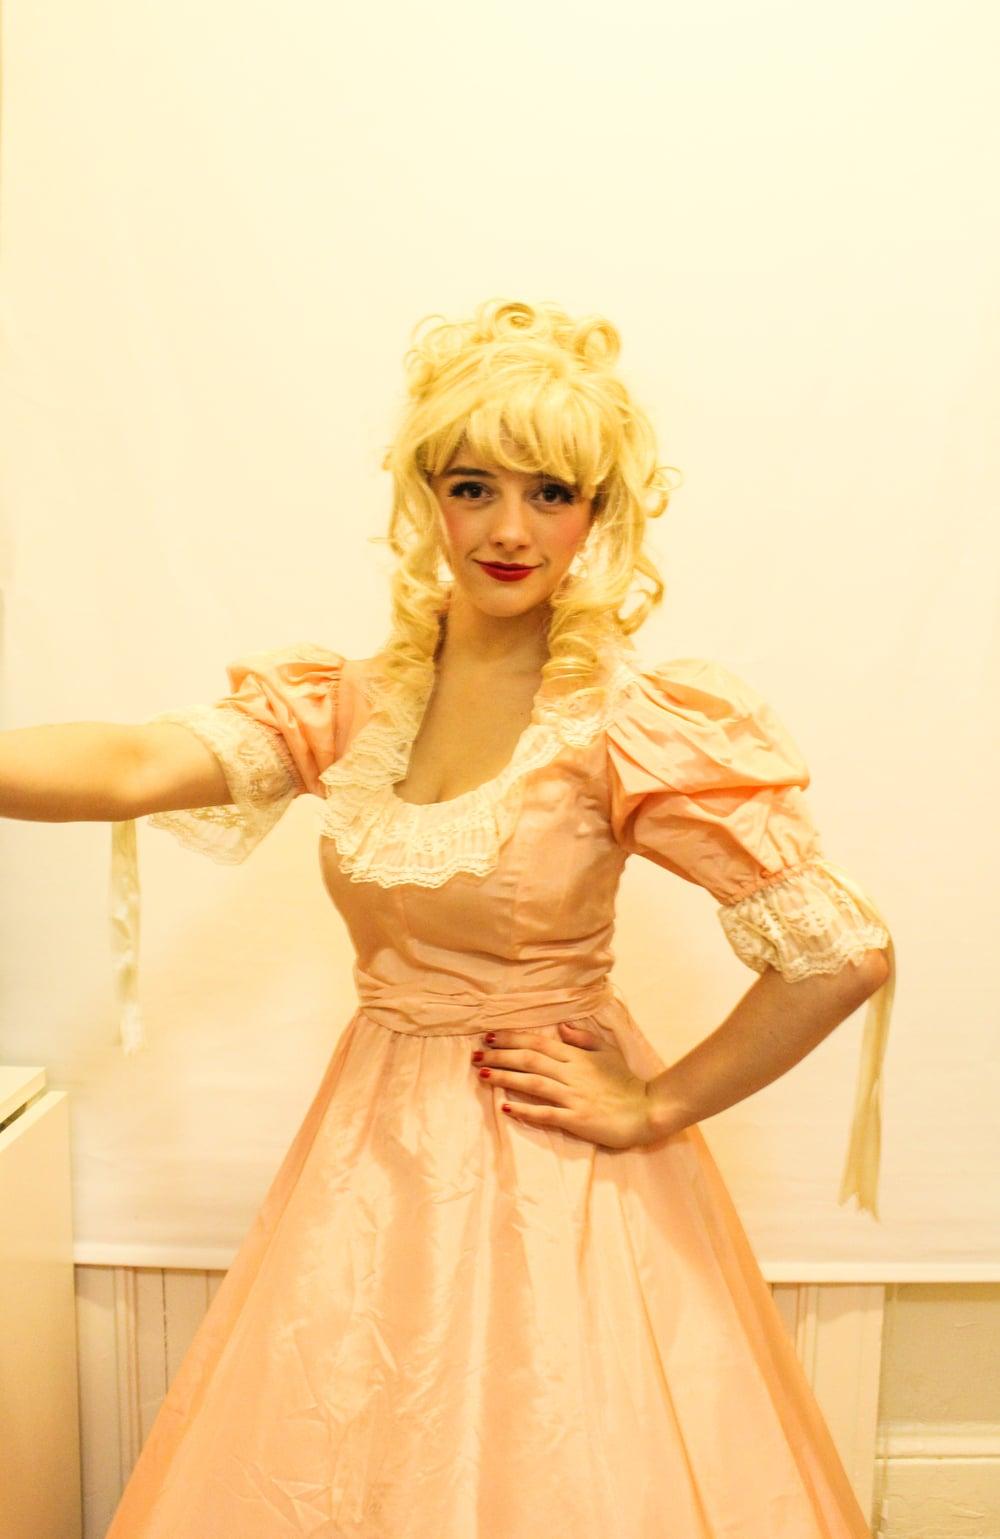 1800s pink dress edited 1.jpg